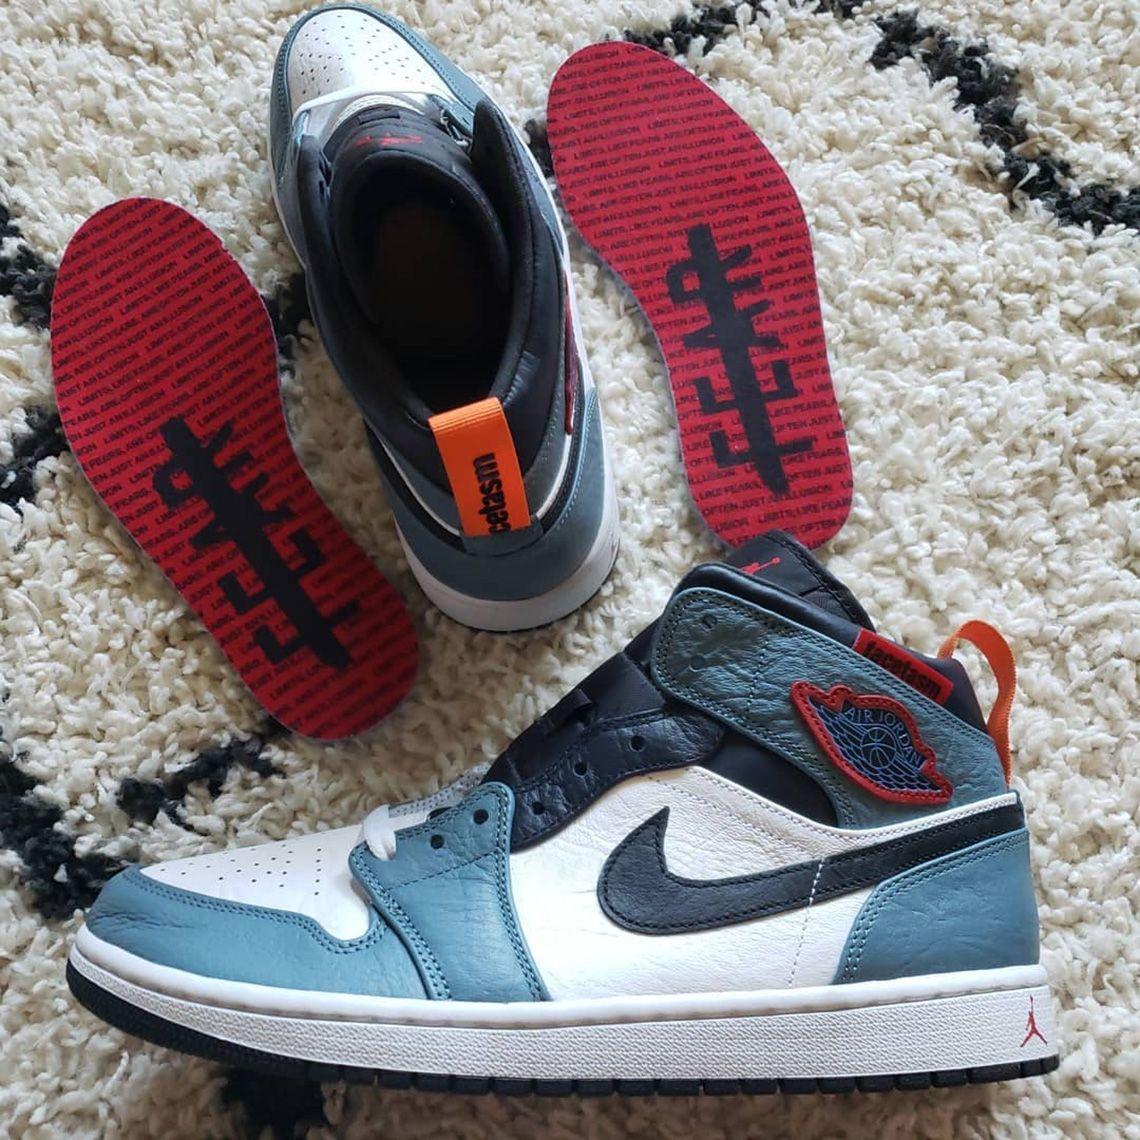 Facetasm Air Jordan 1 Collaboration Release Info Sneakernews Com Air Jordans Jordans Sneakers Men Fashion